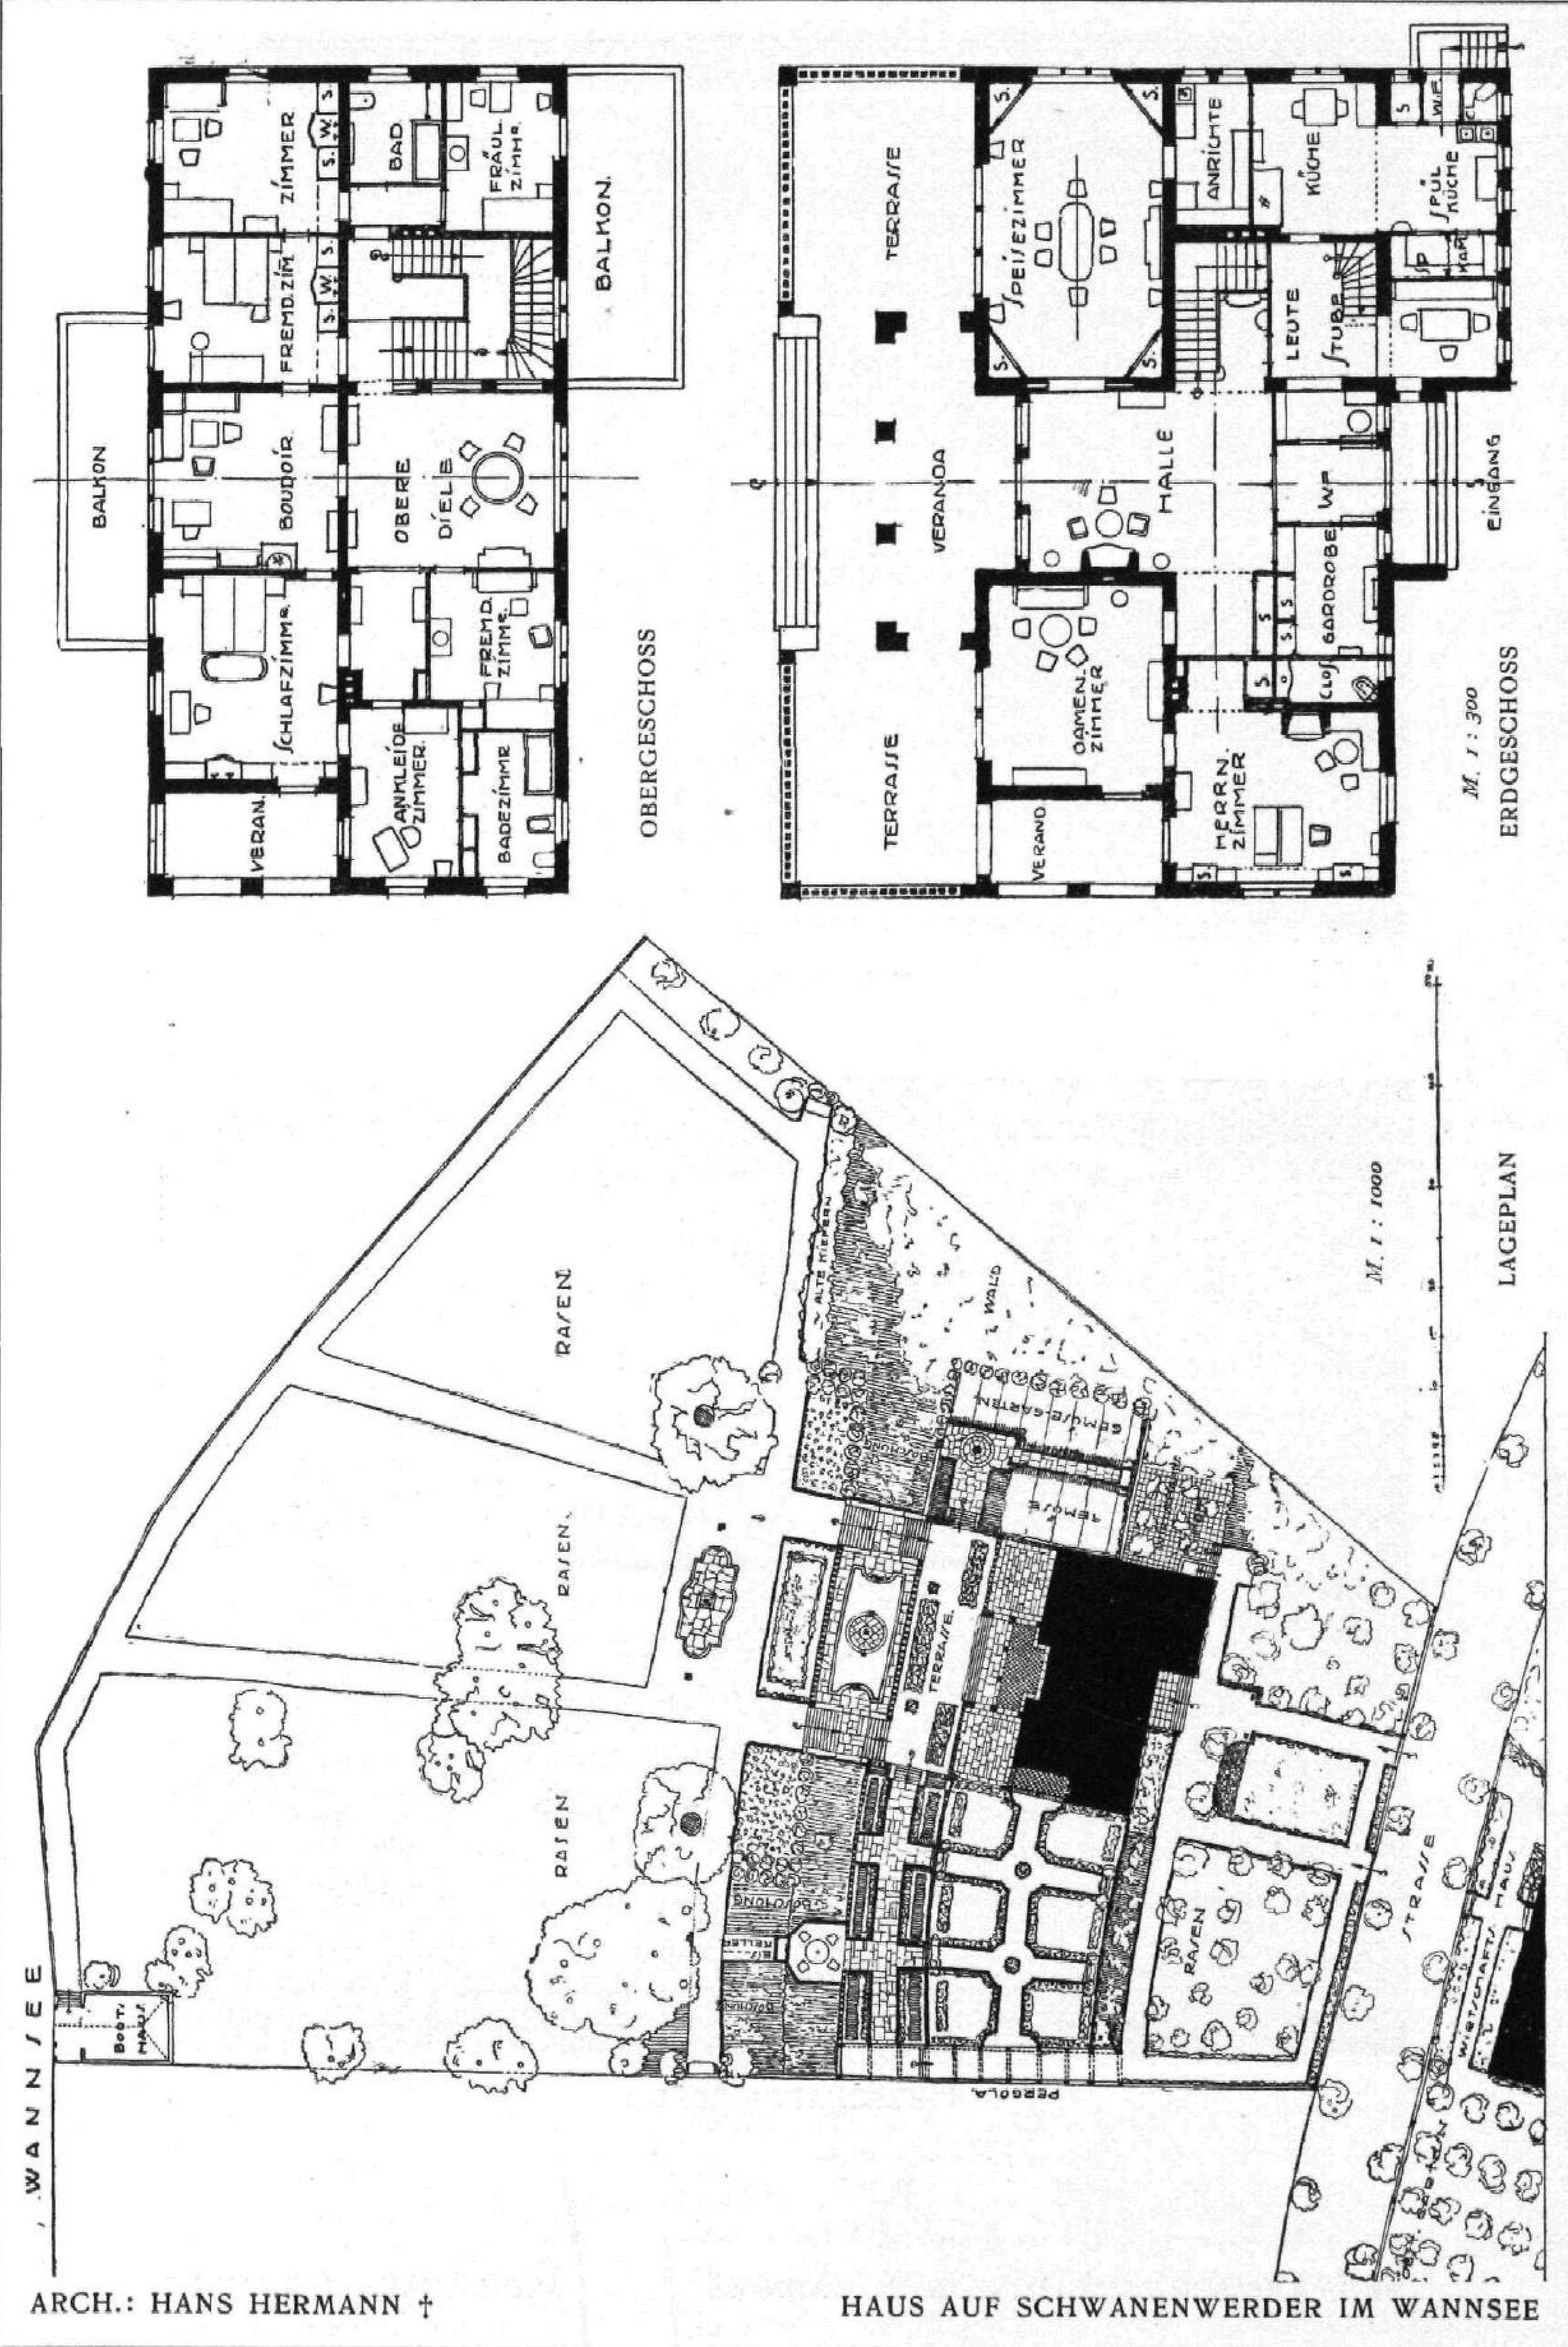 Filebaw 1916 Haus Auf Schwanenwerder Grundriss Wikimedia January 2013 Schematic Diagram Current 1831 14 Thumbnail For